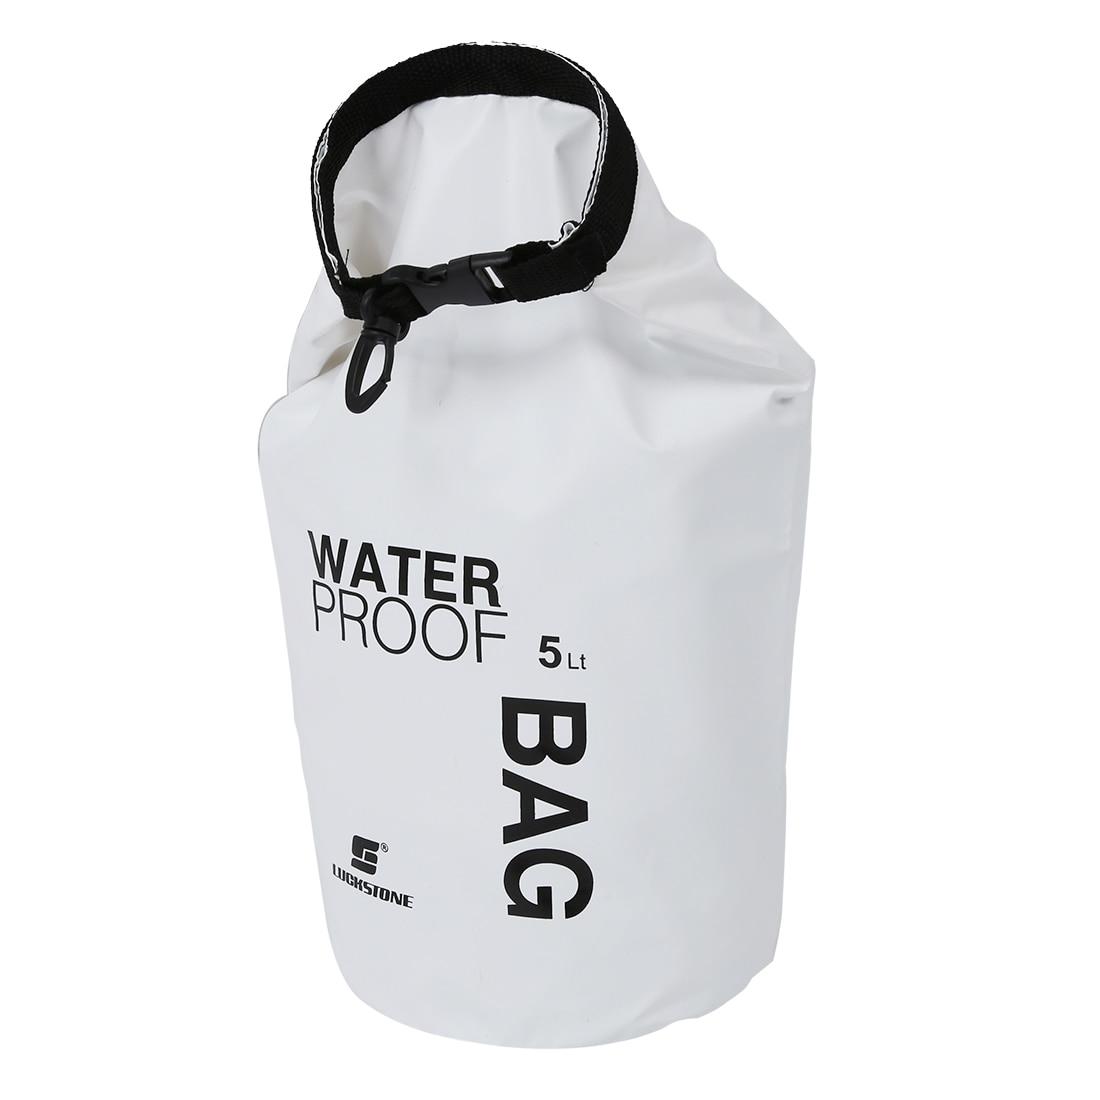 LUCKSTONE 5L Ultralight Outdoor Waterproof Rafting Dry Bag Camping Travel Kit Equipment Canoe Kayak Swimming Bags Storage White